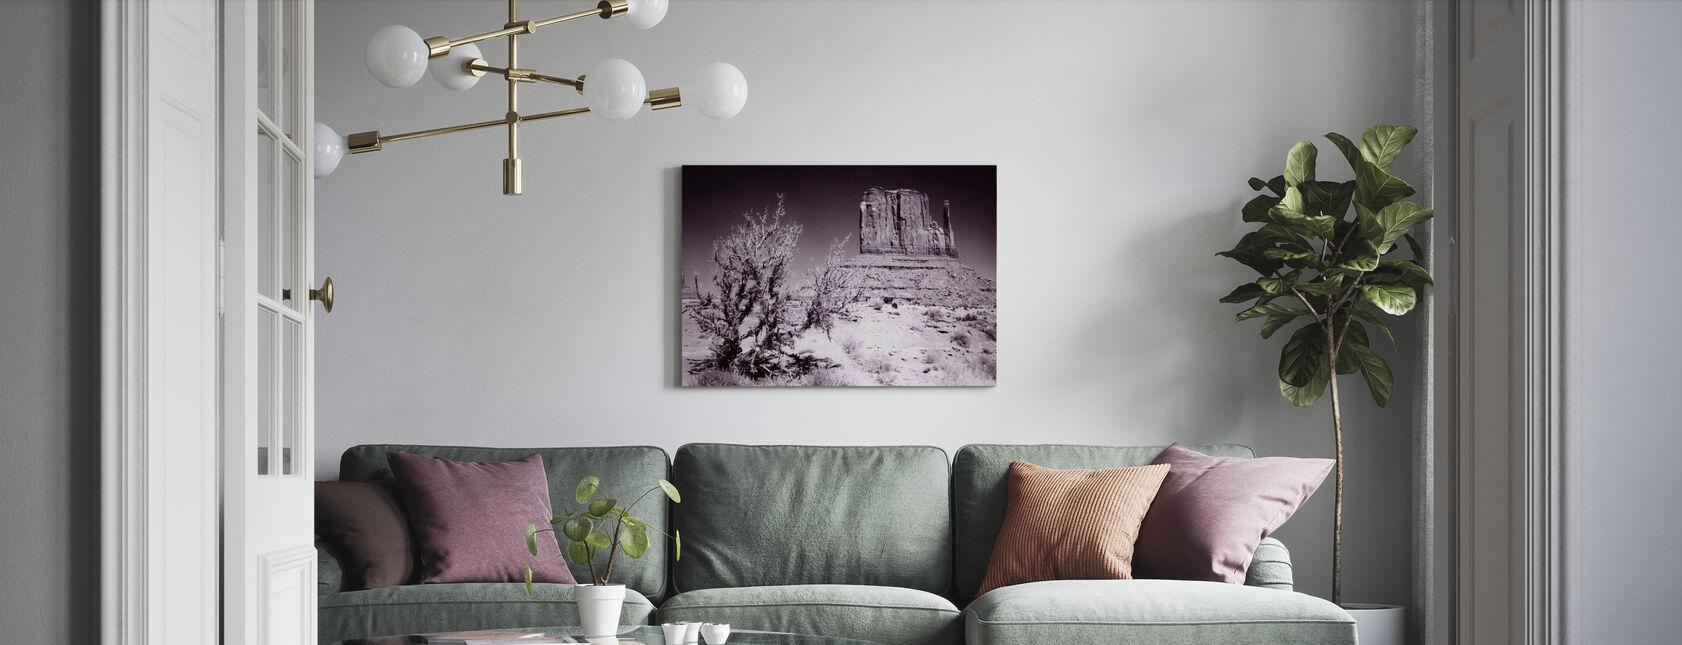 Monument Valley, Utah, USA - Canvastavla - Vardagsrum